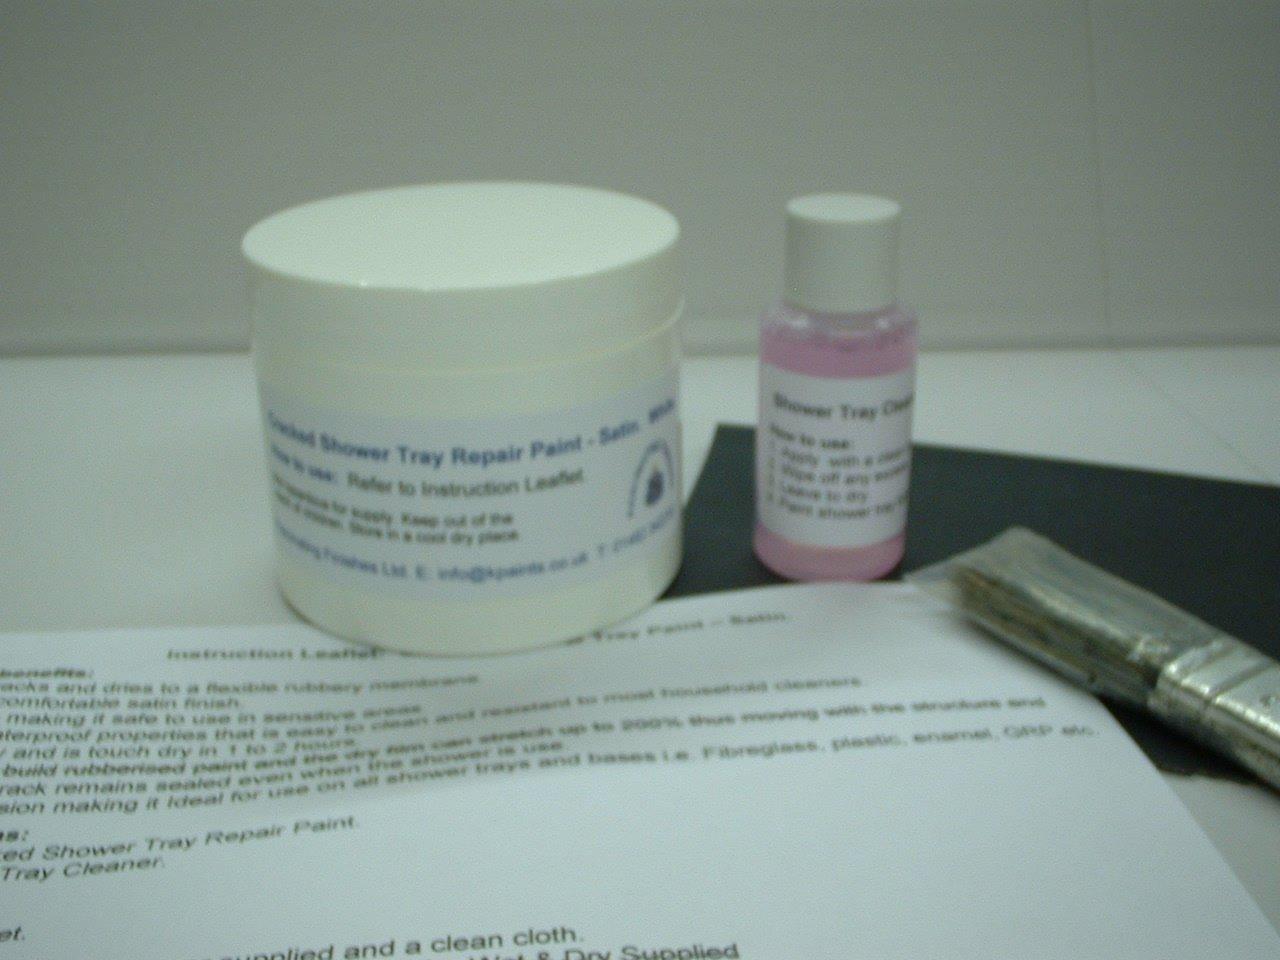 1 x Cracked Shower Tray / Base Repair Paint. Satin White.: Amazon.co ...